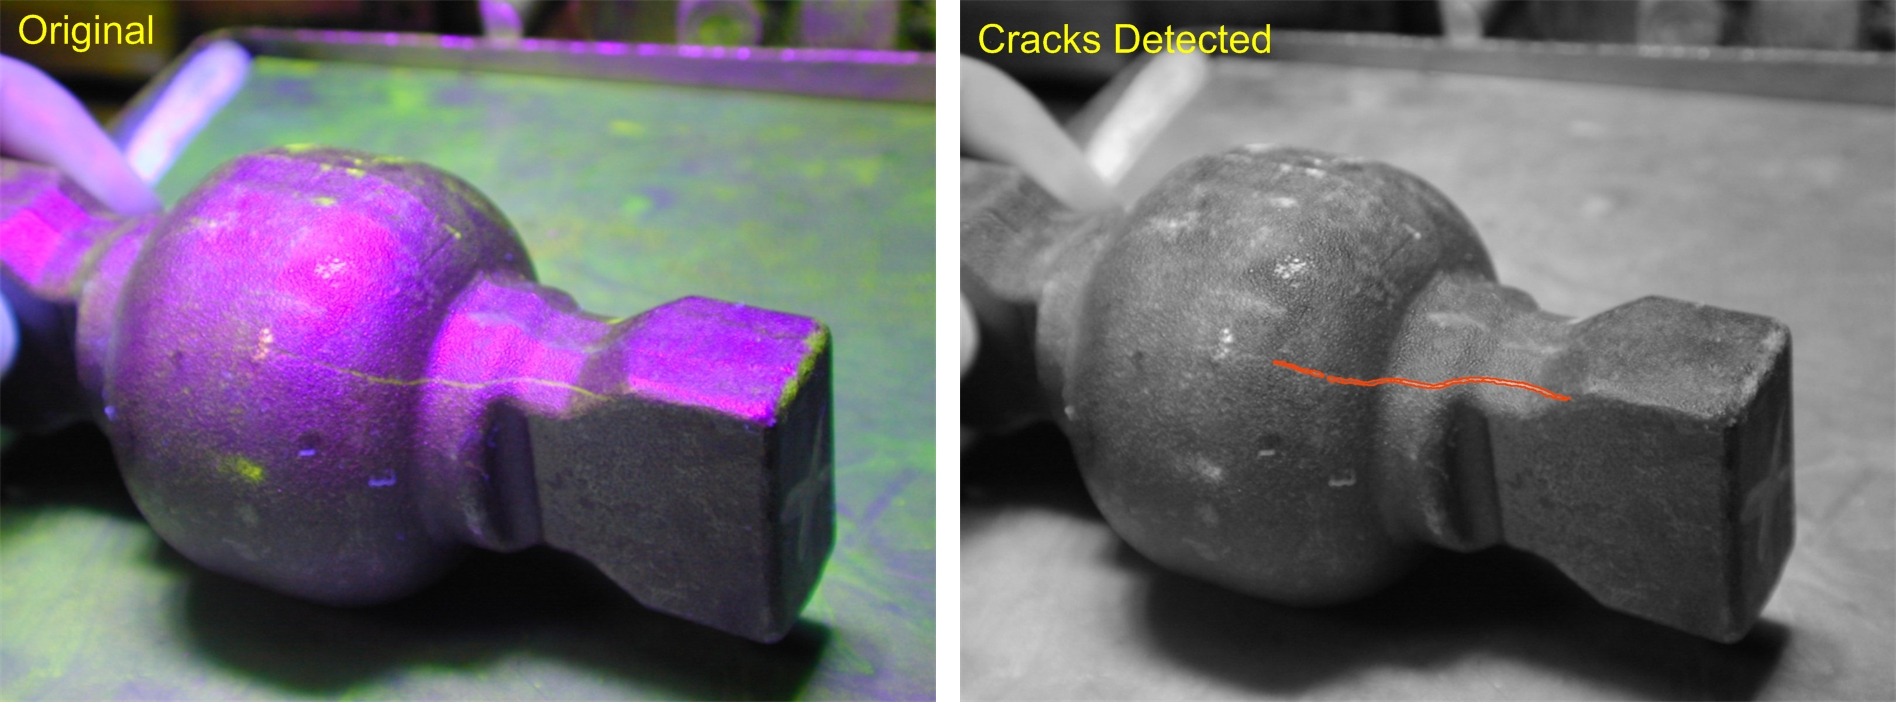 Gv 02 Crack Detection 171 Sonicdiagnostic